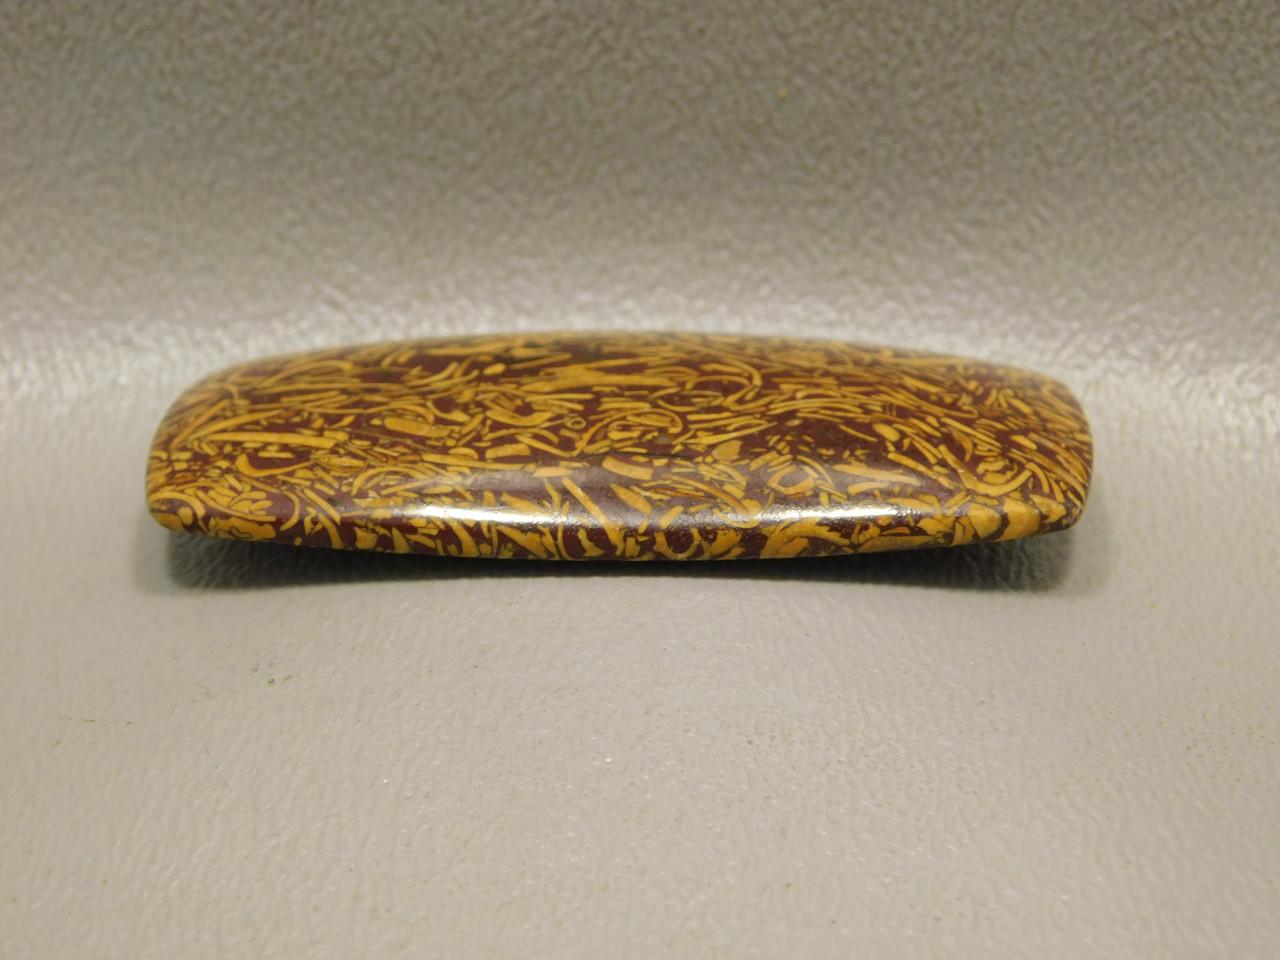 Cabochon Coquina Jasper Cobra Elephant Skin Script Stone  #16